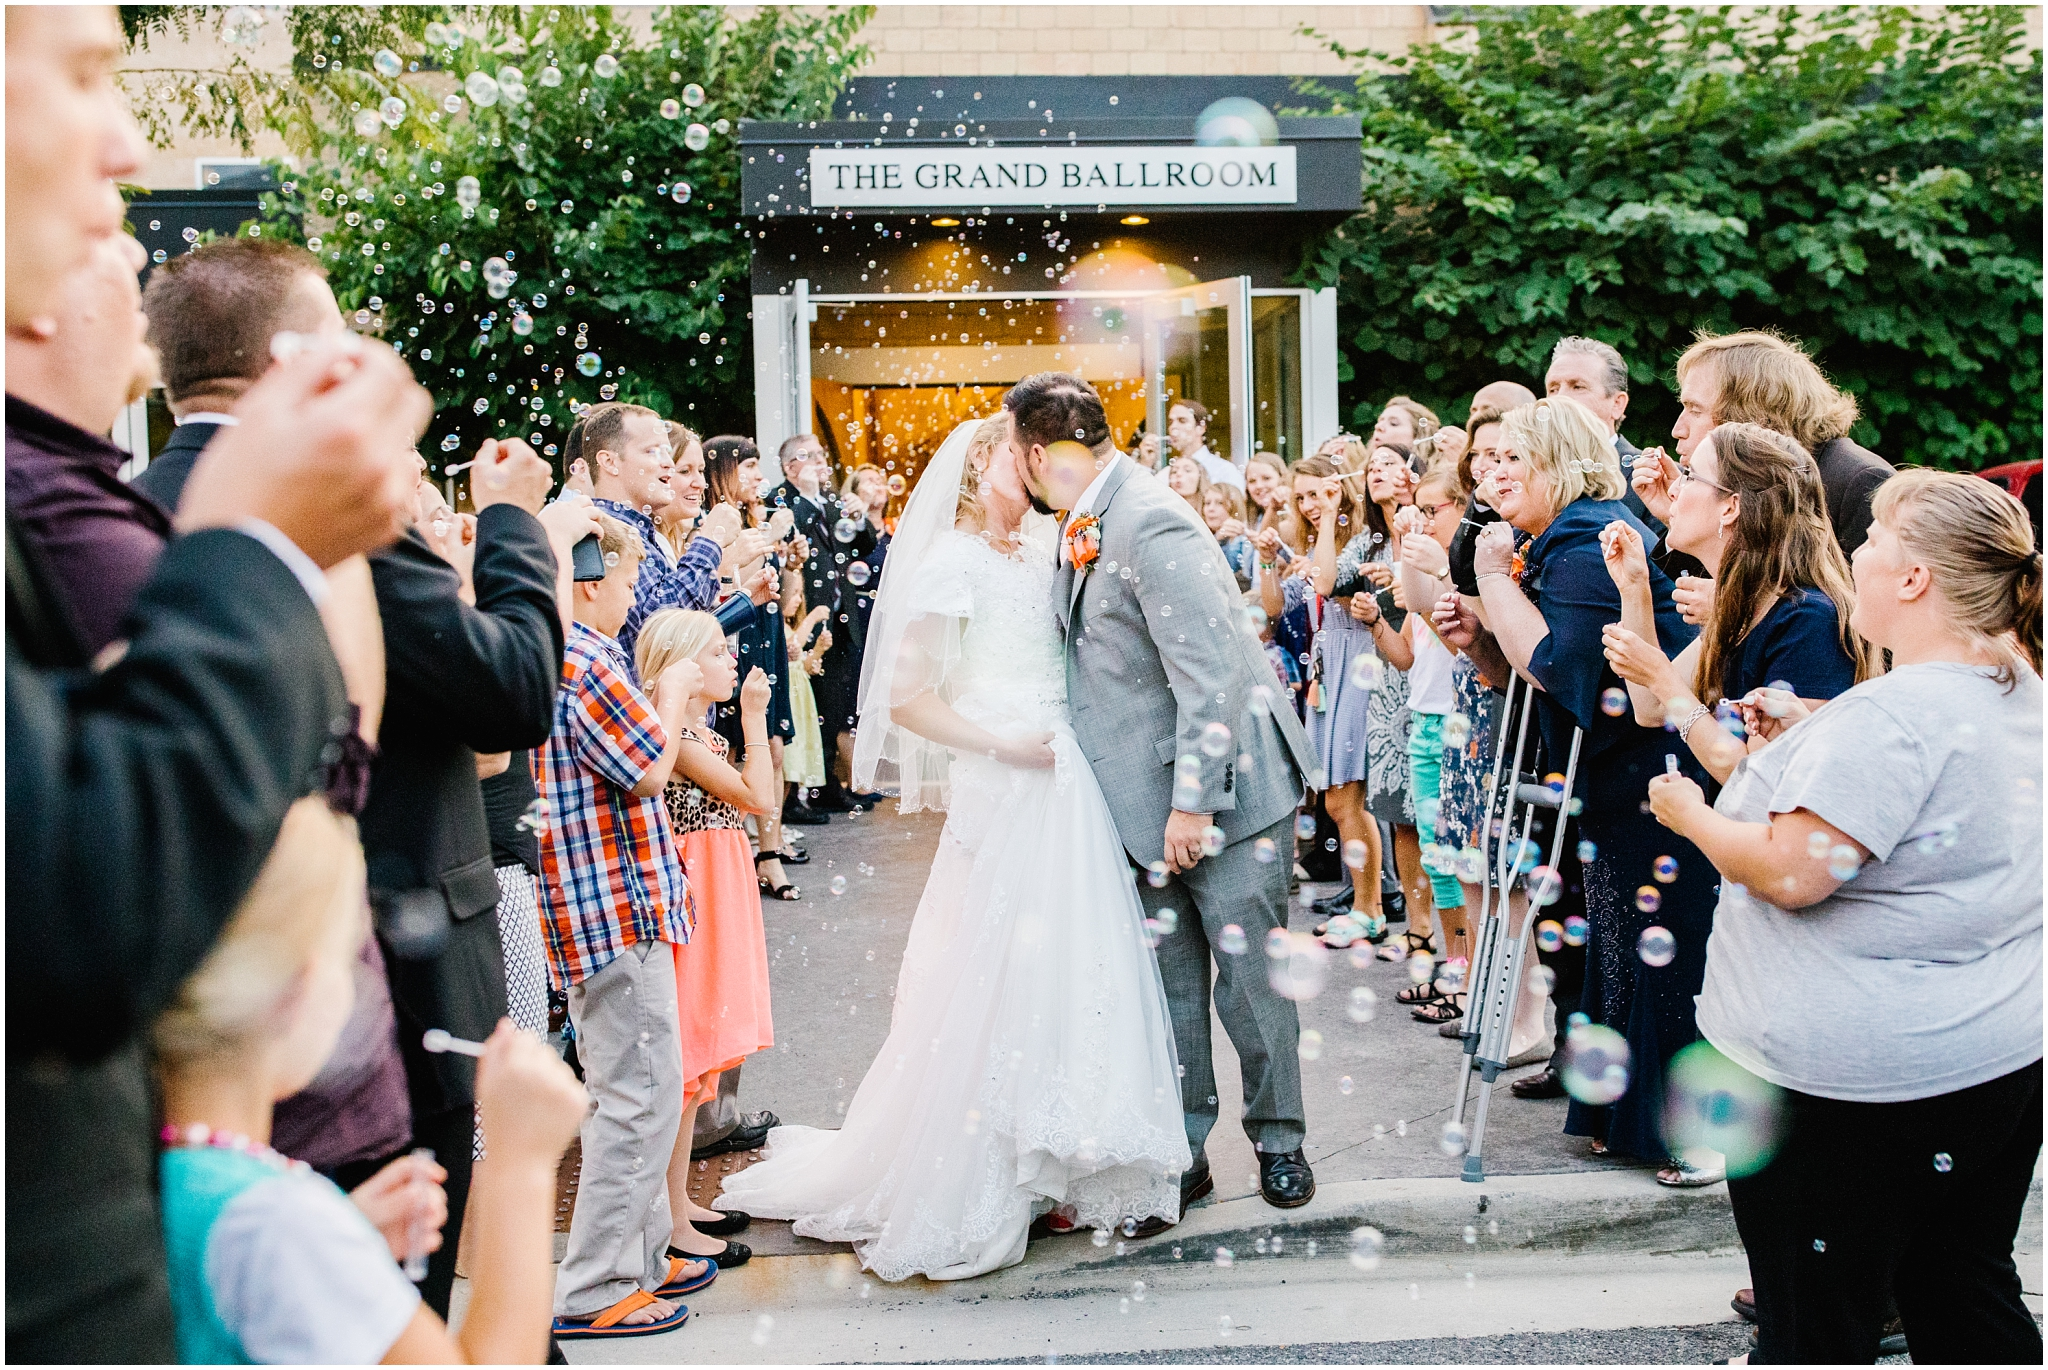 Justin and Melissa-484_Lizzie-B-Imagery-Utah-Wedding-Photographer-Salt-Lake-City-Temple-The-Grand-Ballroom.jpg